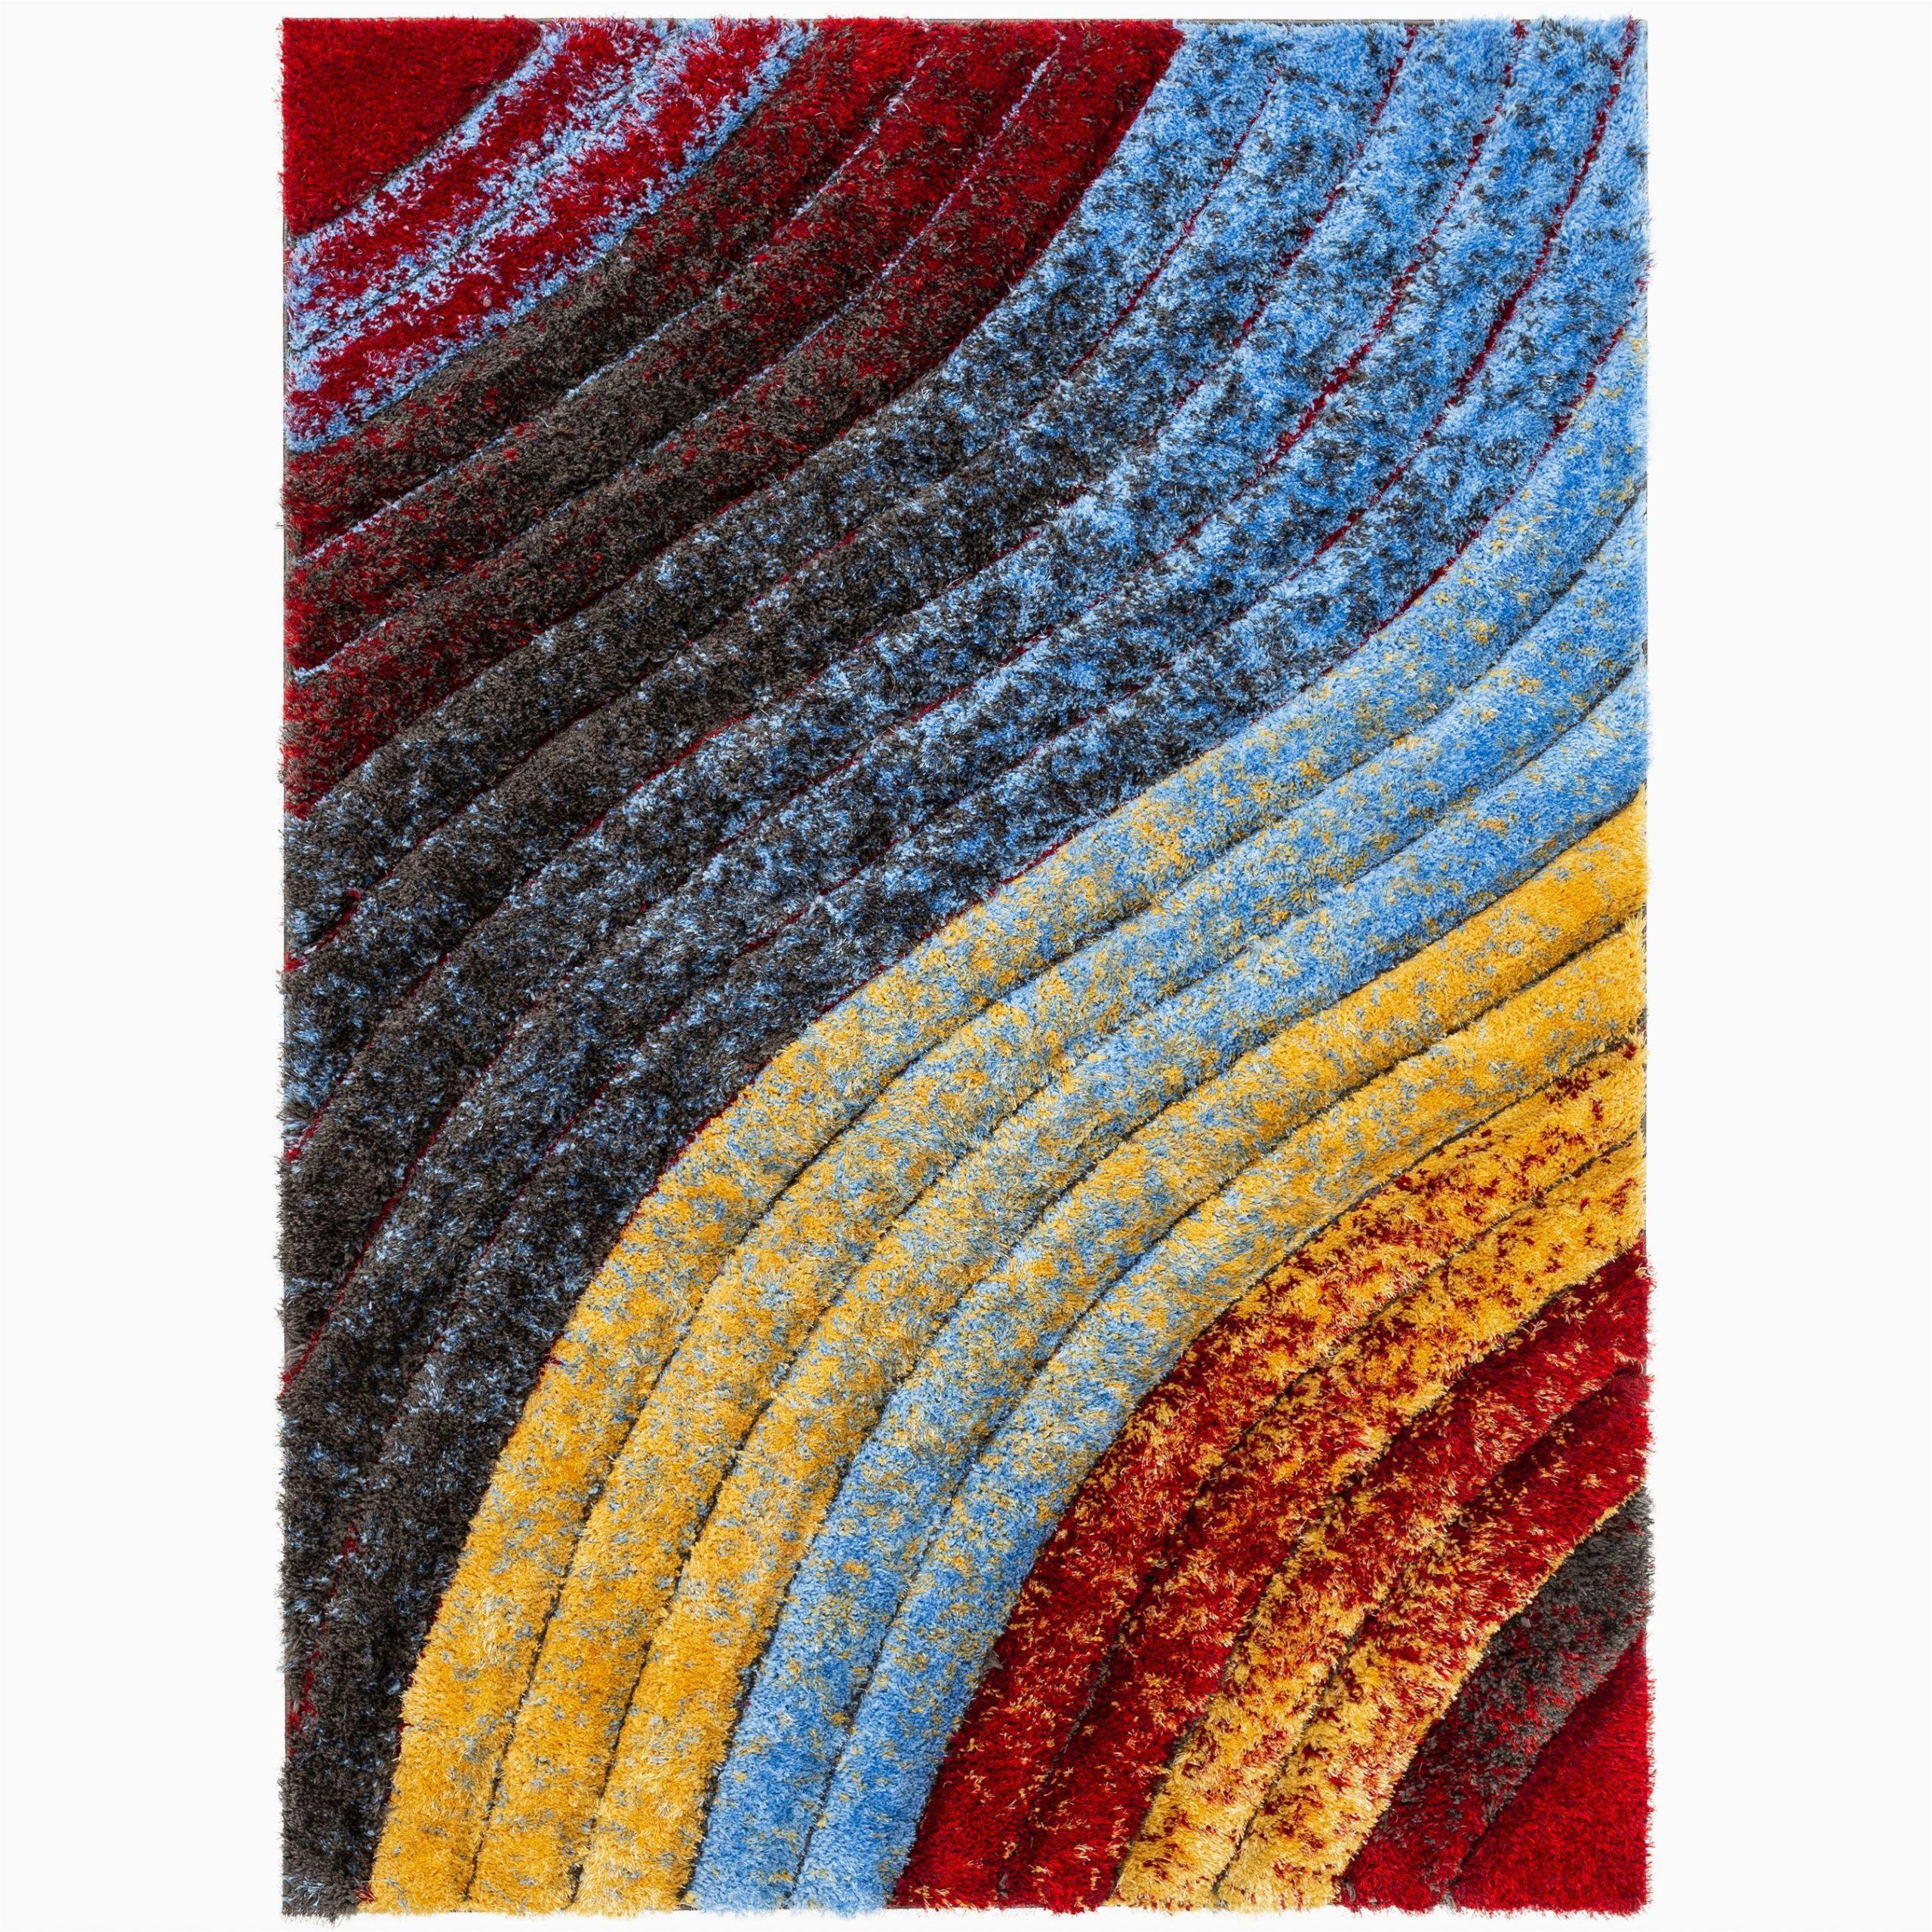 Thick Plush area Rugs 8×10 Well Woven Maura Multi Geometric Stripes Thick soft Plush